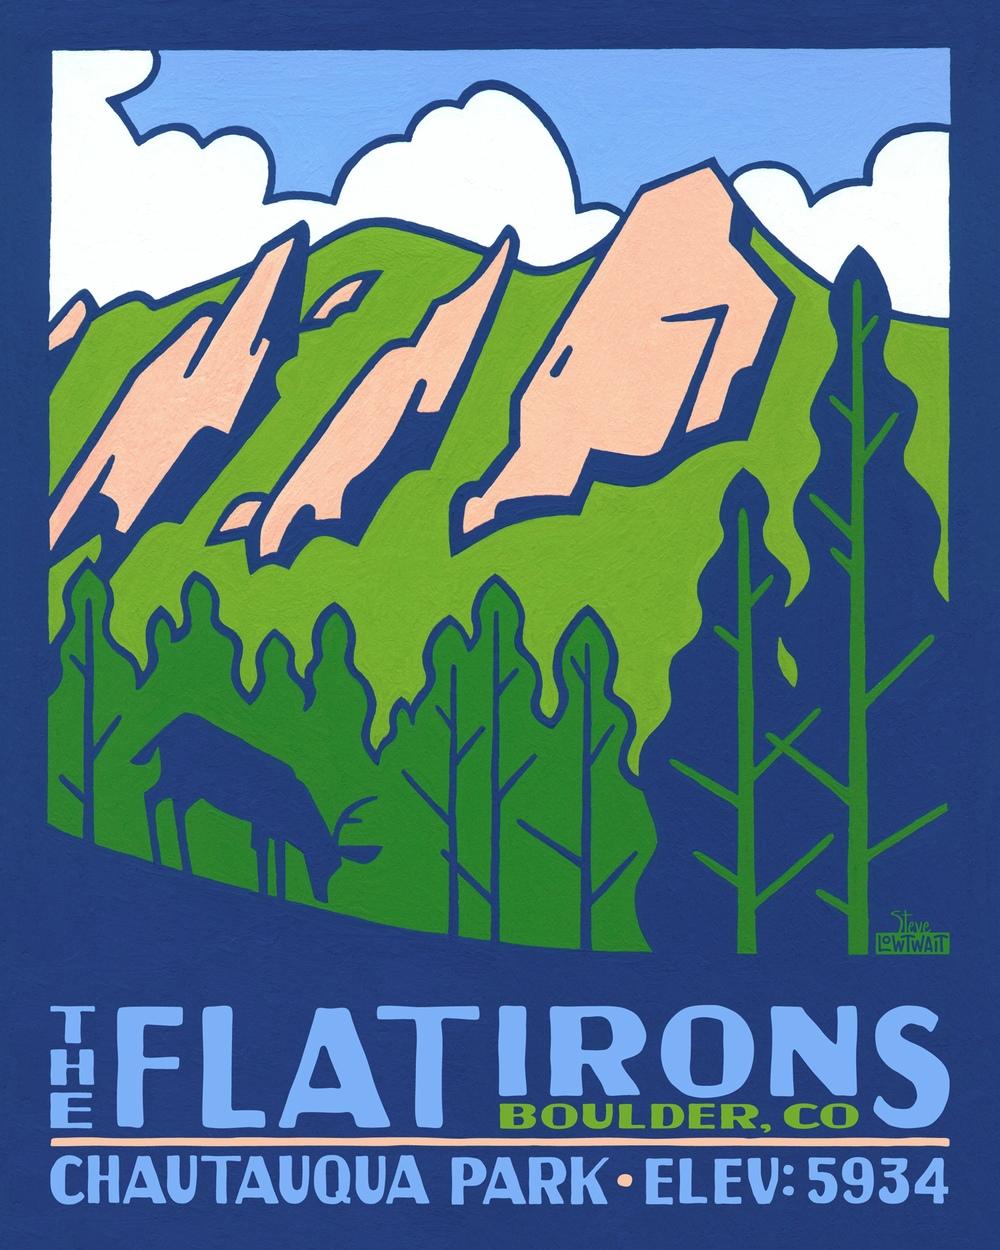 Flatirons_Boulder_Colorado.jpg